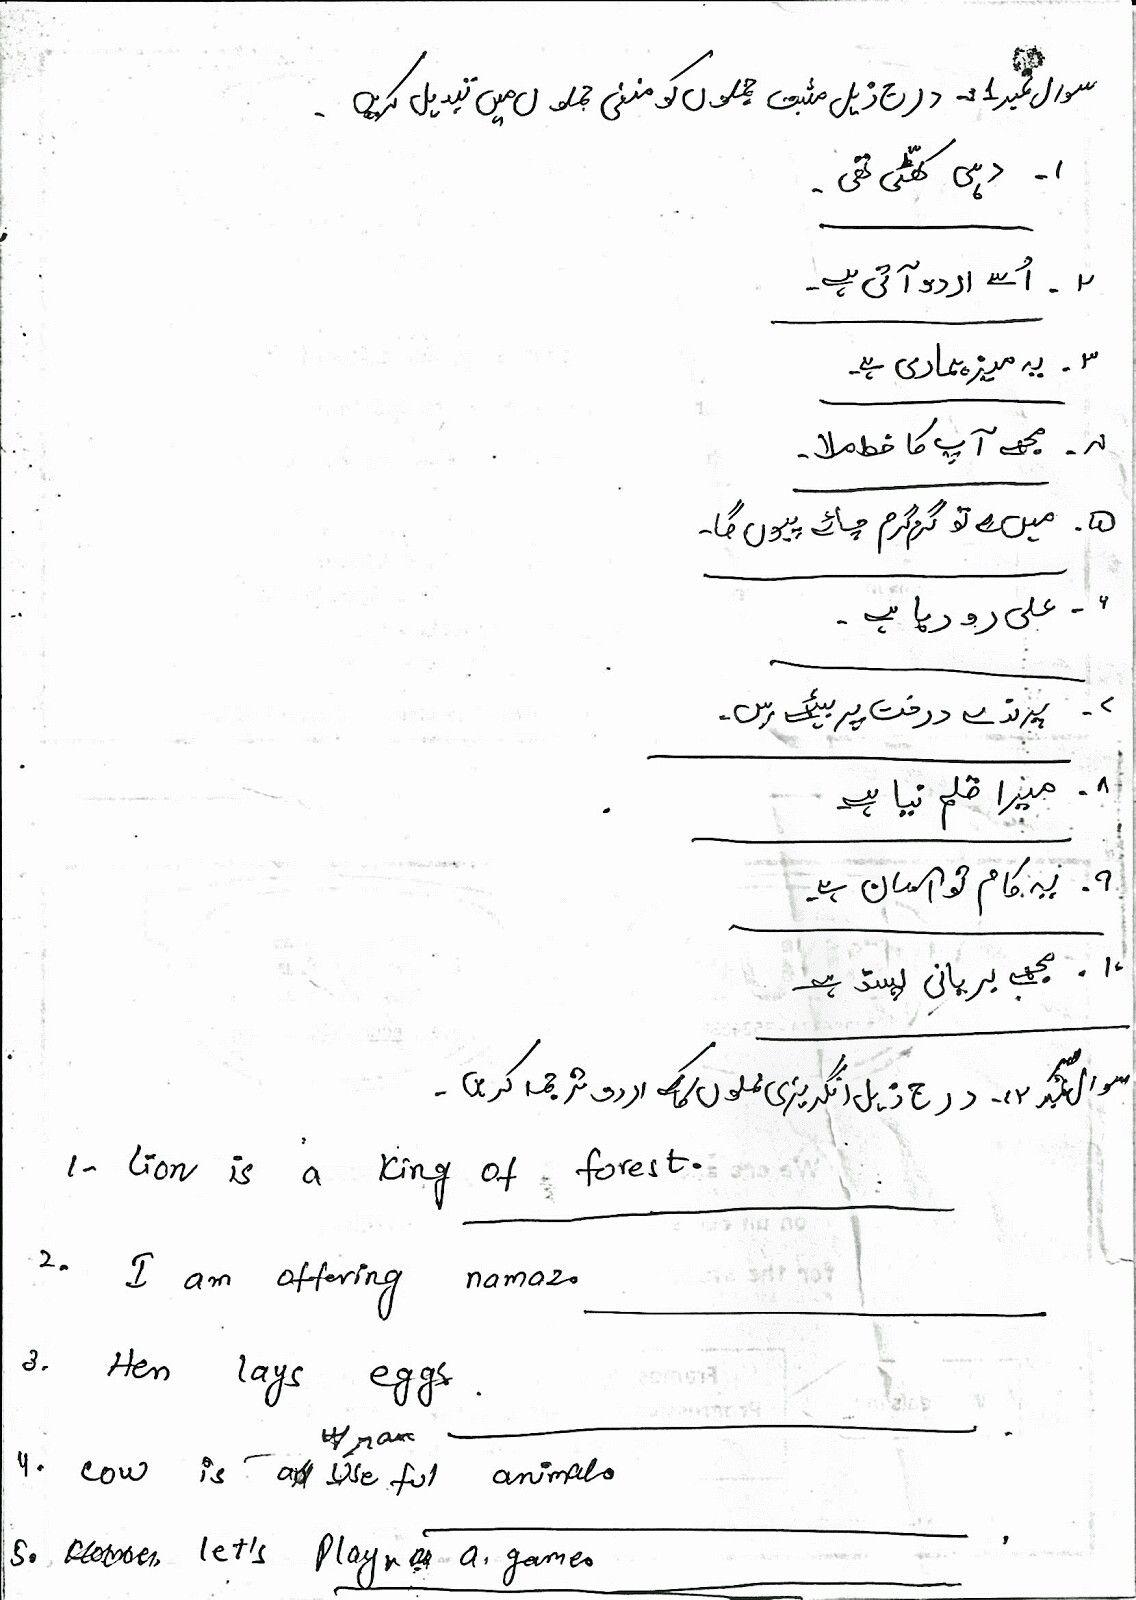 Urdu Handwriting Khushkati Calligraphy In Pakistan Handwriting Worksheets Handwriting Alphabet Urdu [ 1169 x 760 Pixel ]